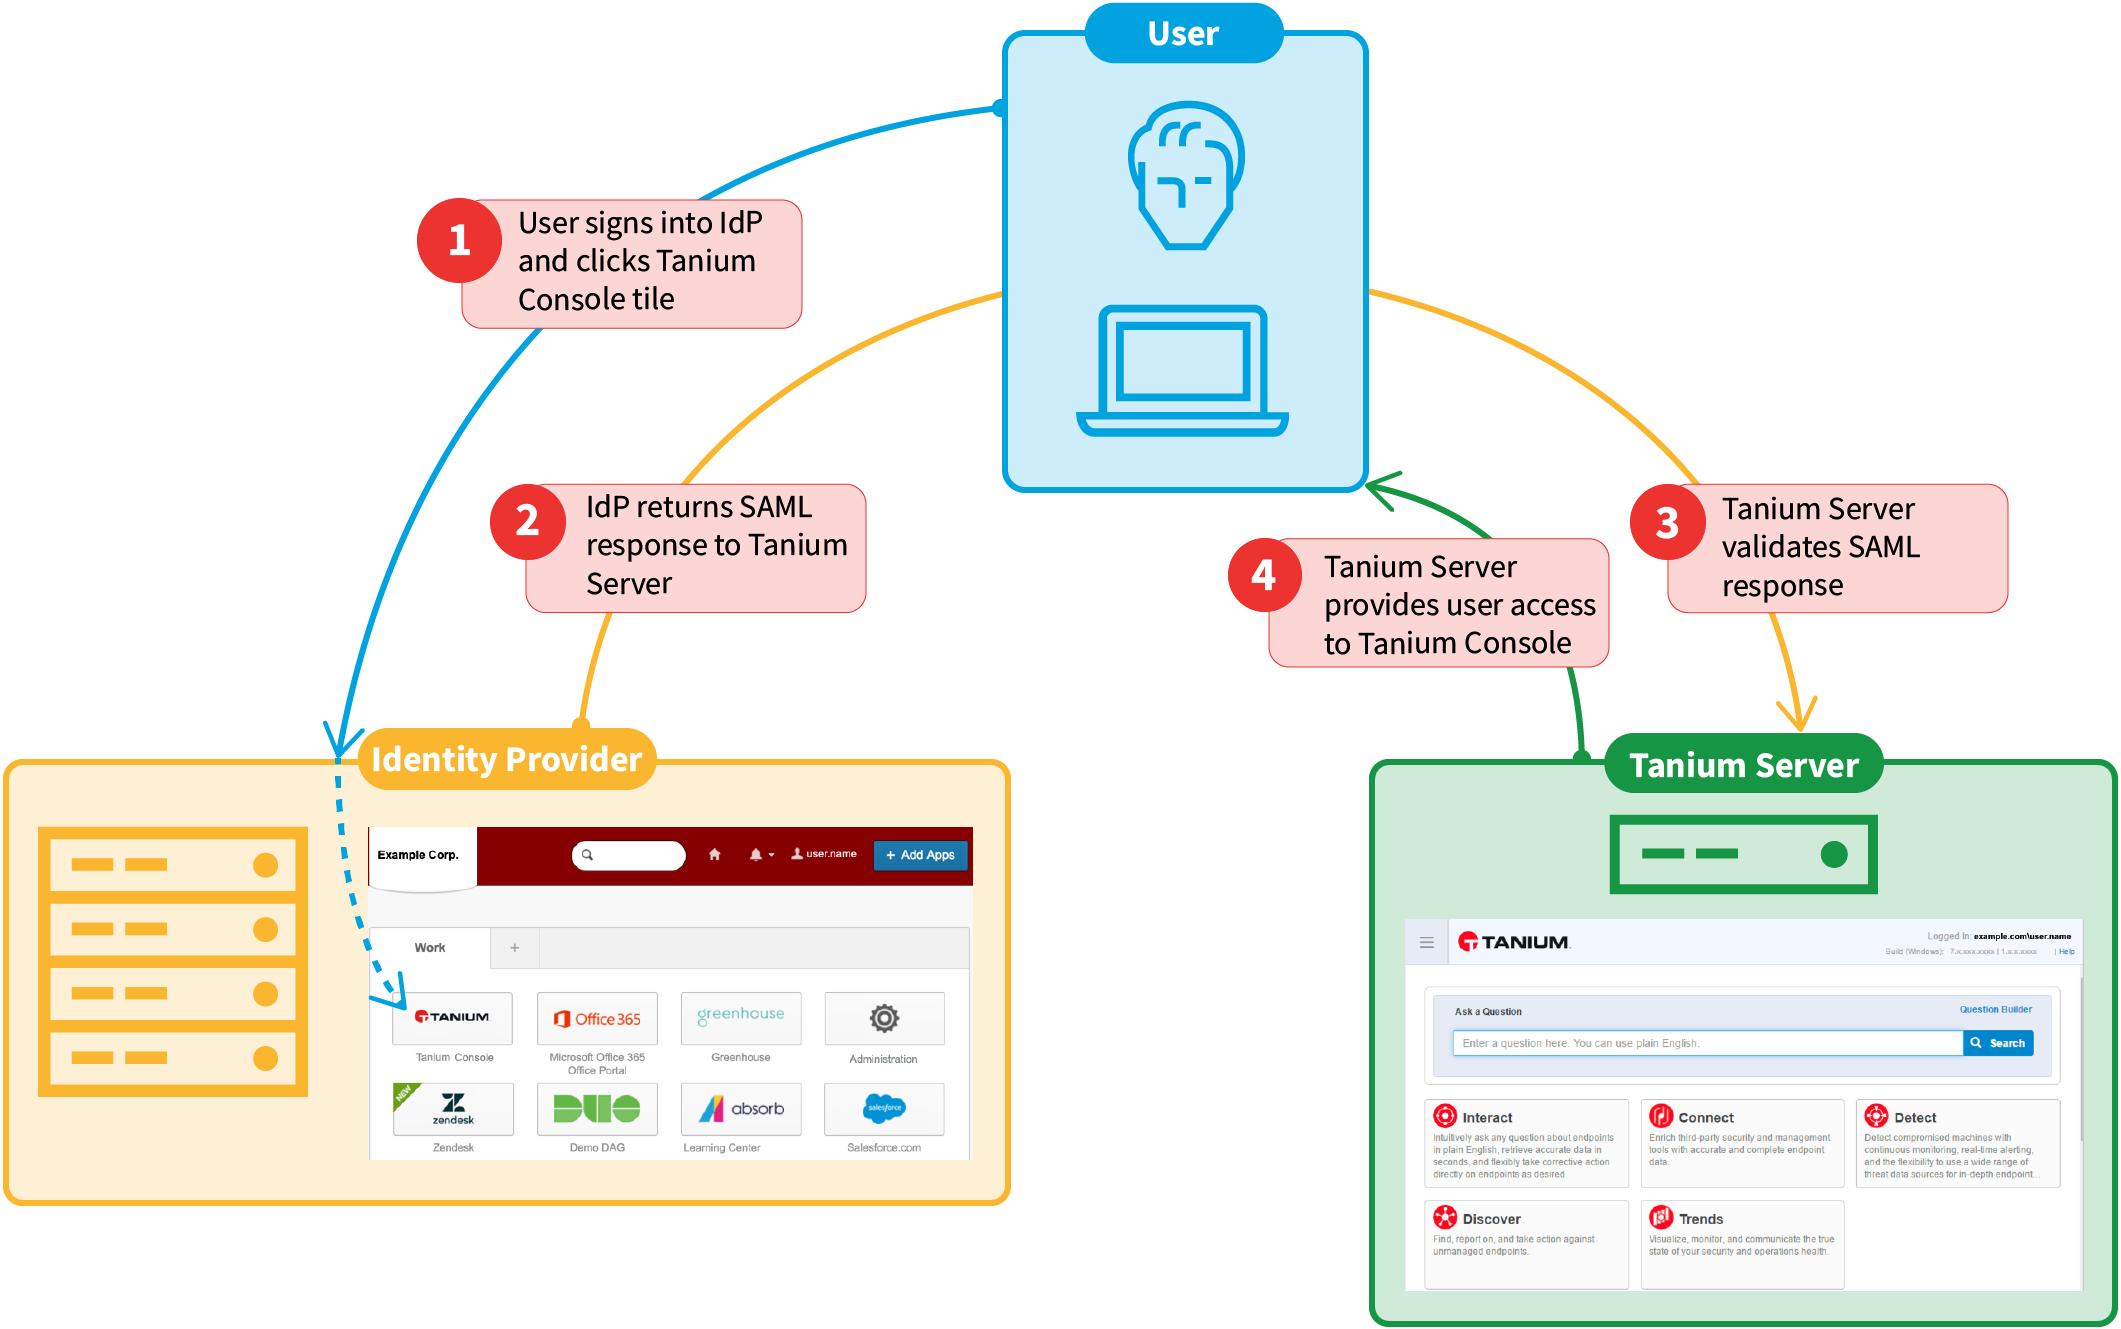 Integrating with a SAML IdP